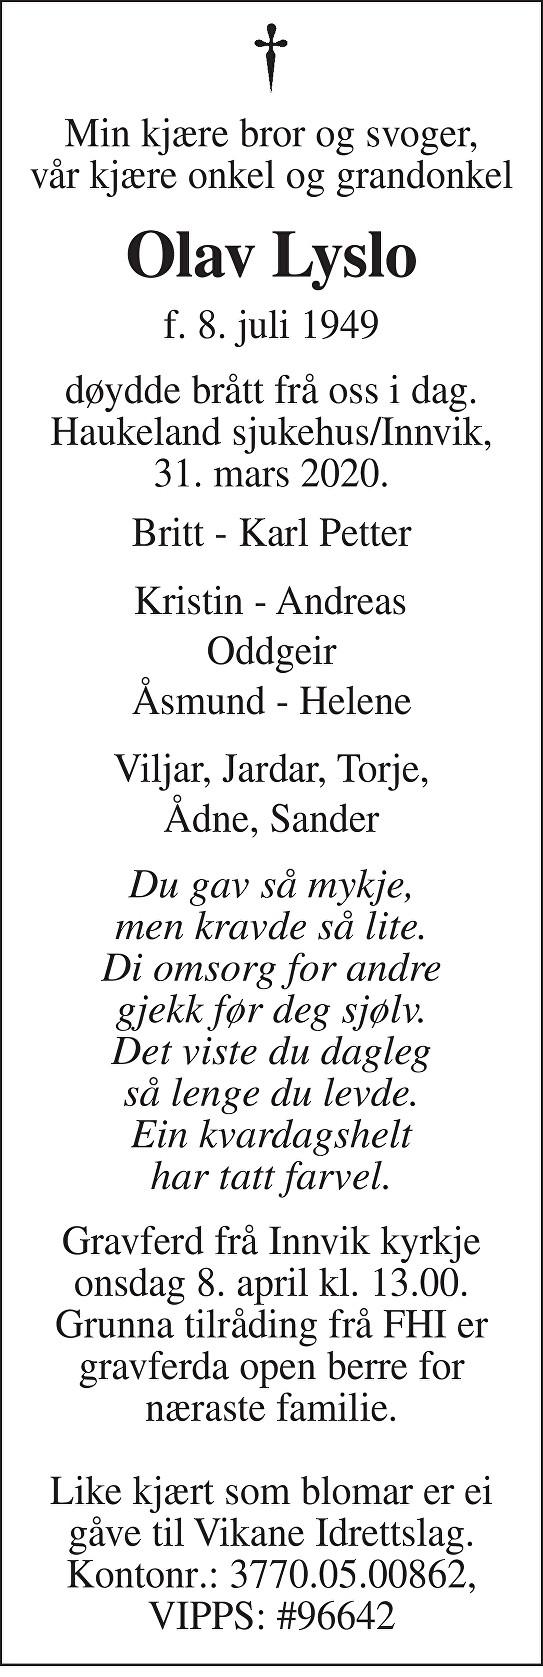 Olav Lyslo Dødsannonse